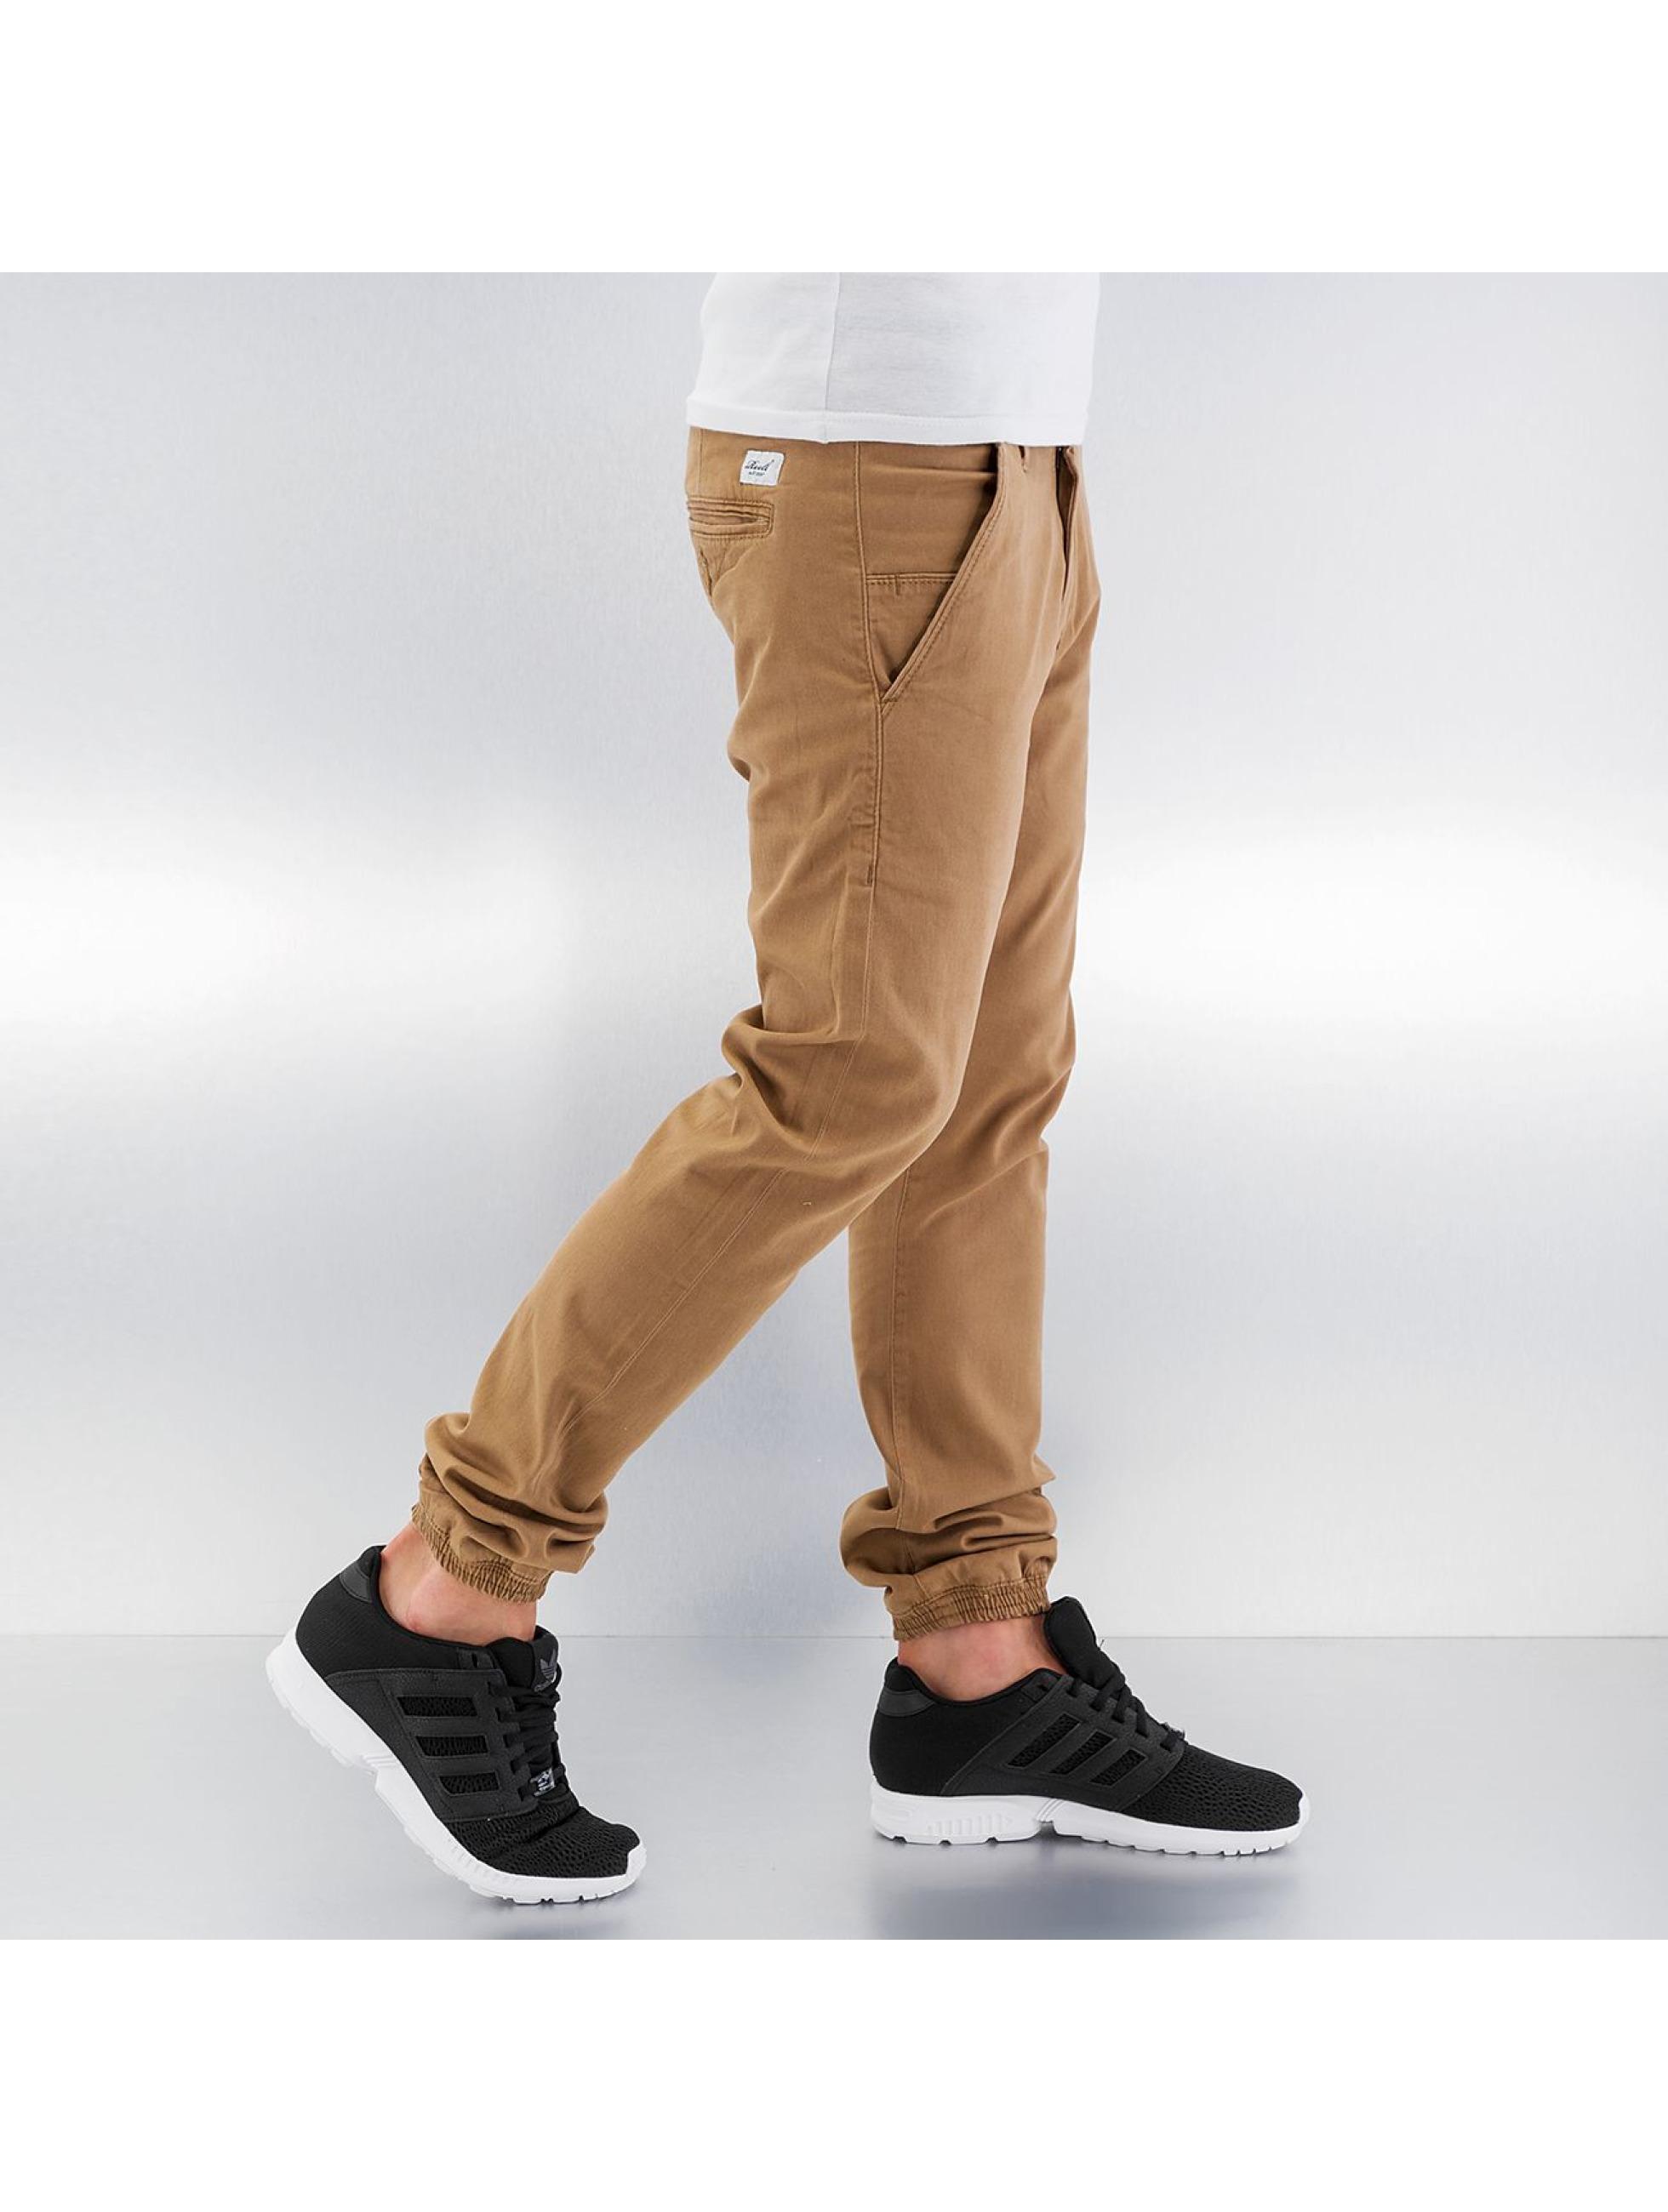 Reell Jeans Chino Jogger braun